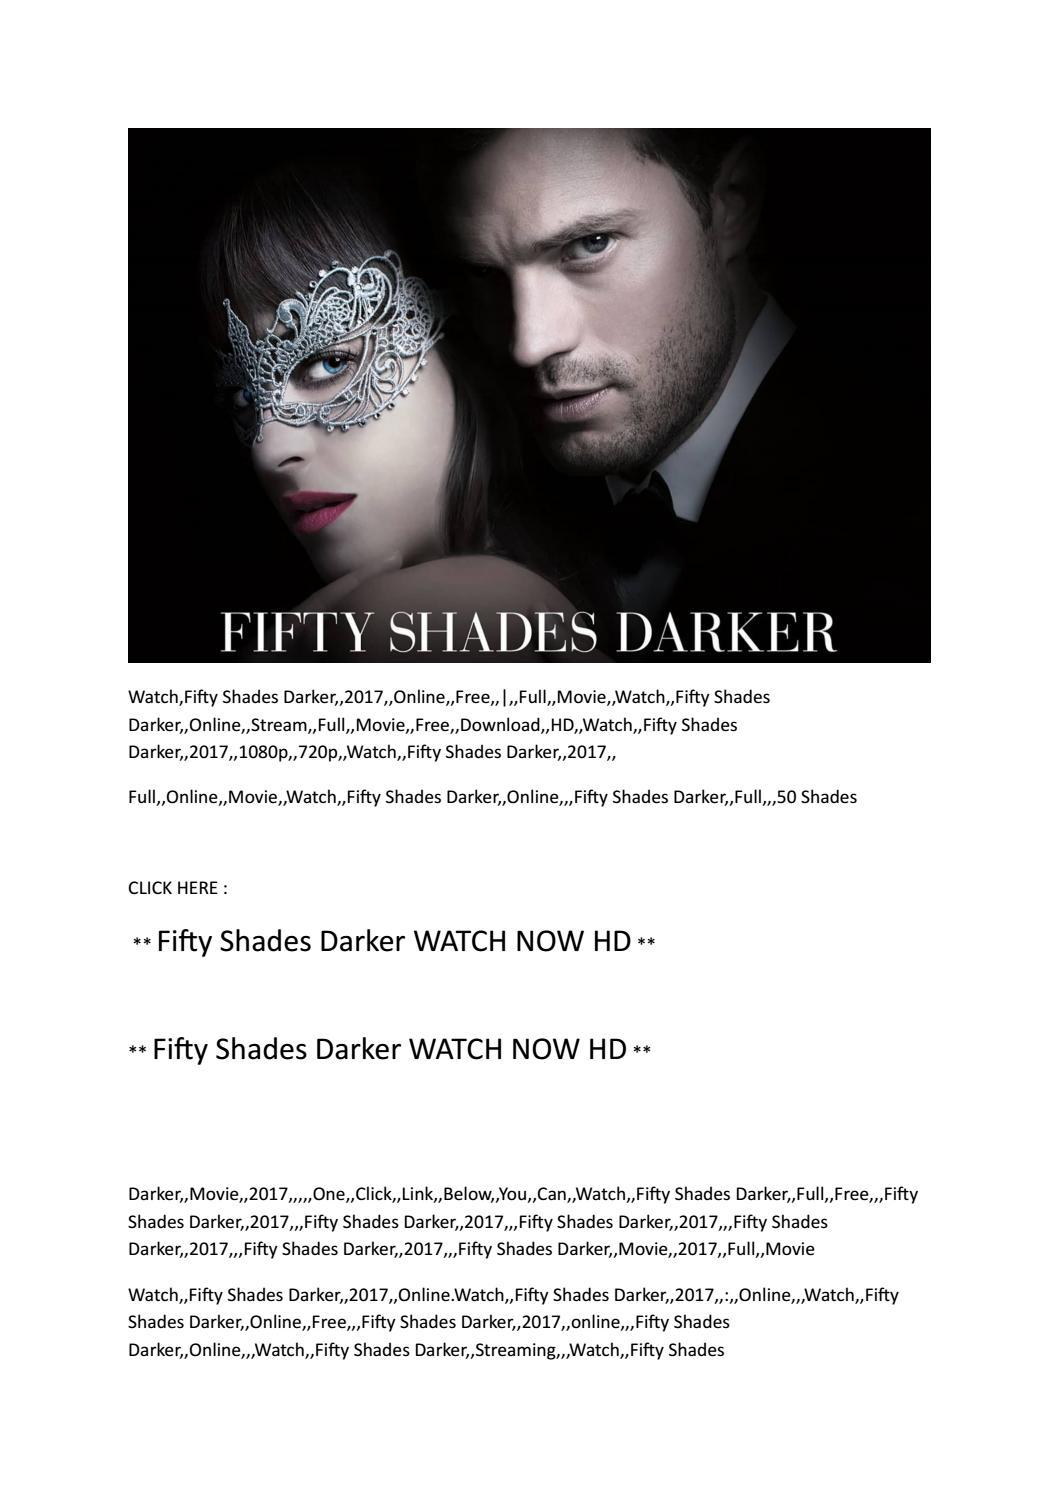 Imdb 50 Fifty Shades Darker Movie Full Online Hd 2017 Megashow By Lamborgu Issuu